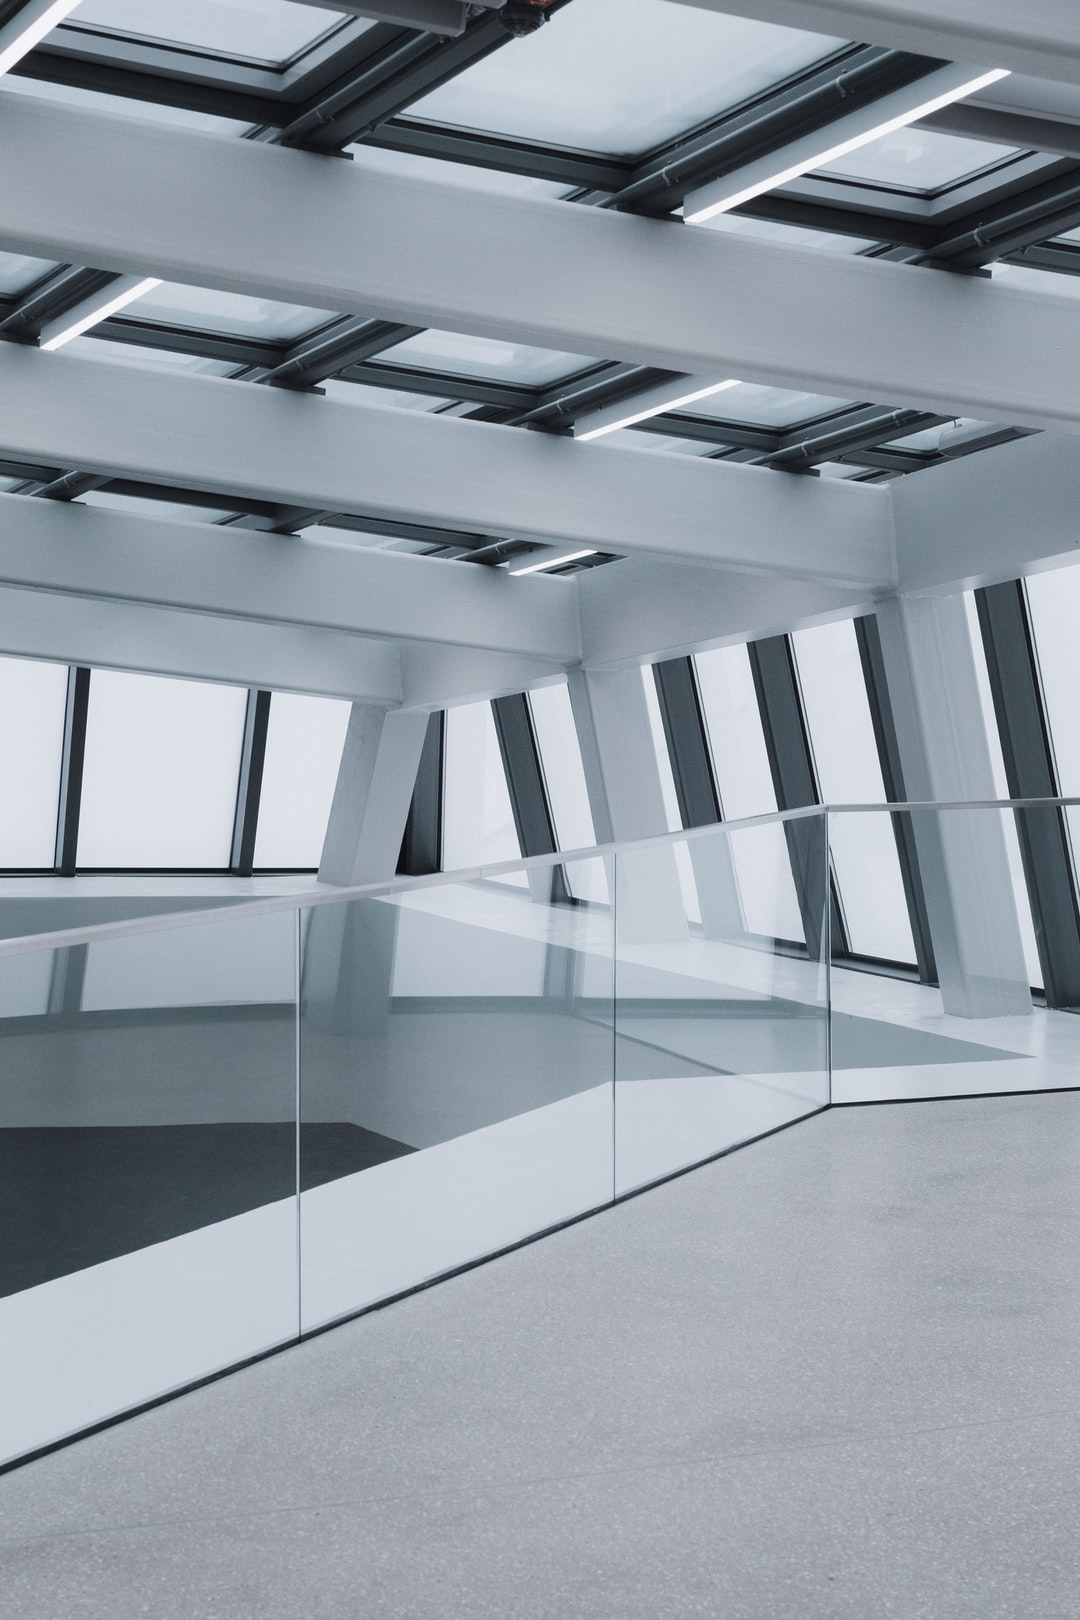 Interior design pictures download free images on unsplash for Interior design online free